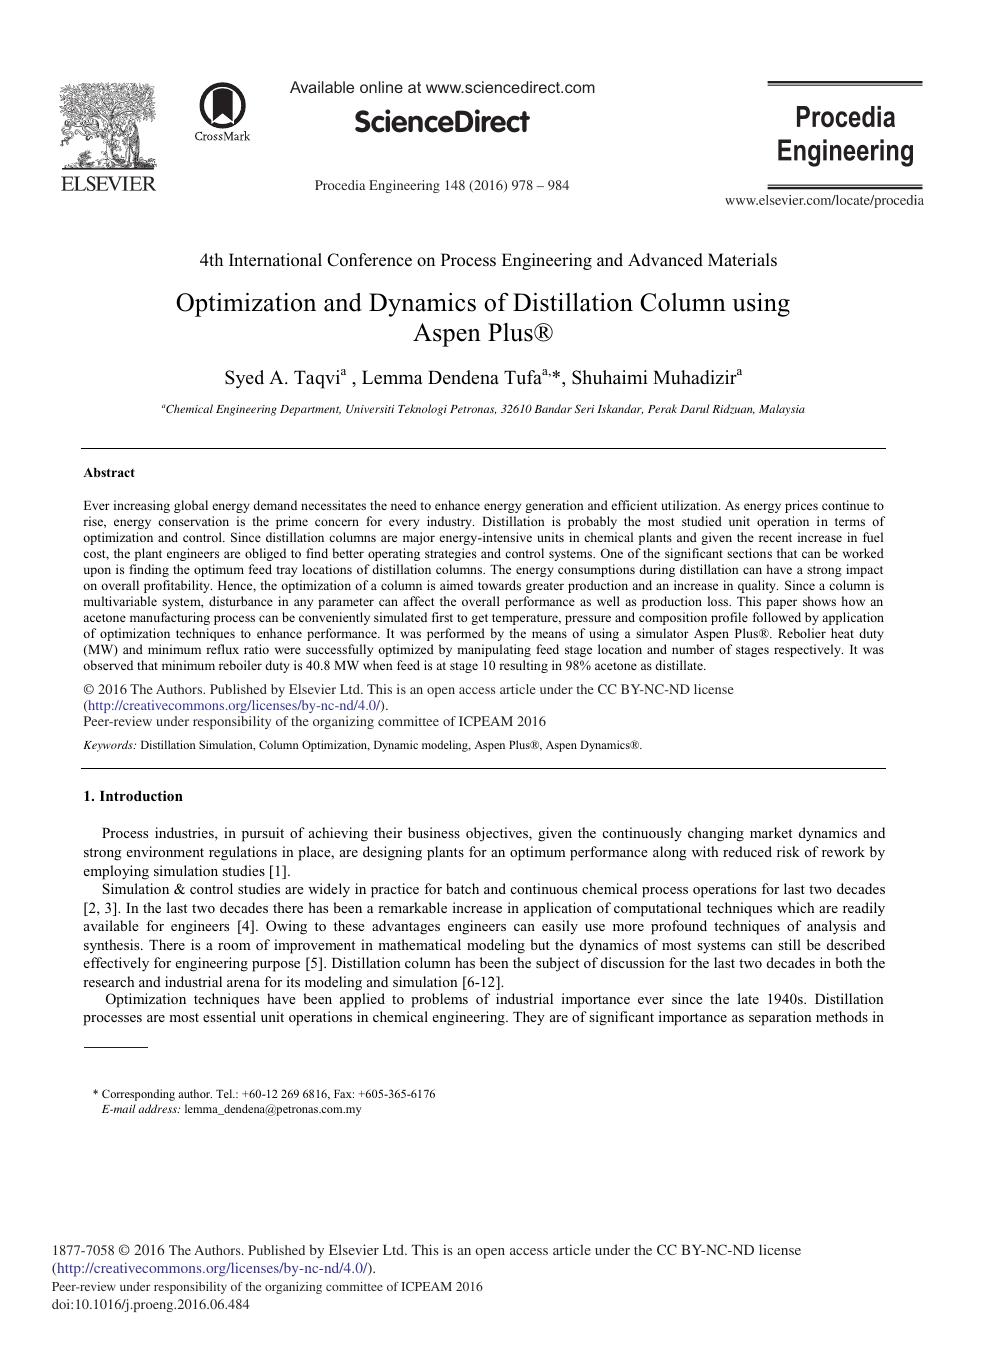 Optimization and Dynamics of Distillation Column Using Aspen